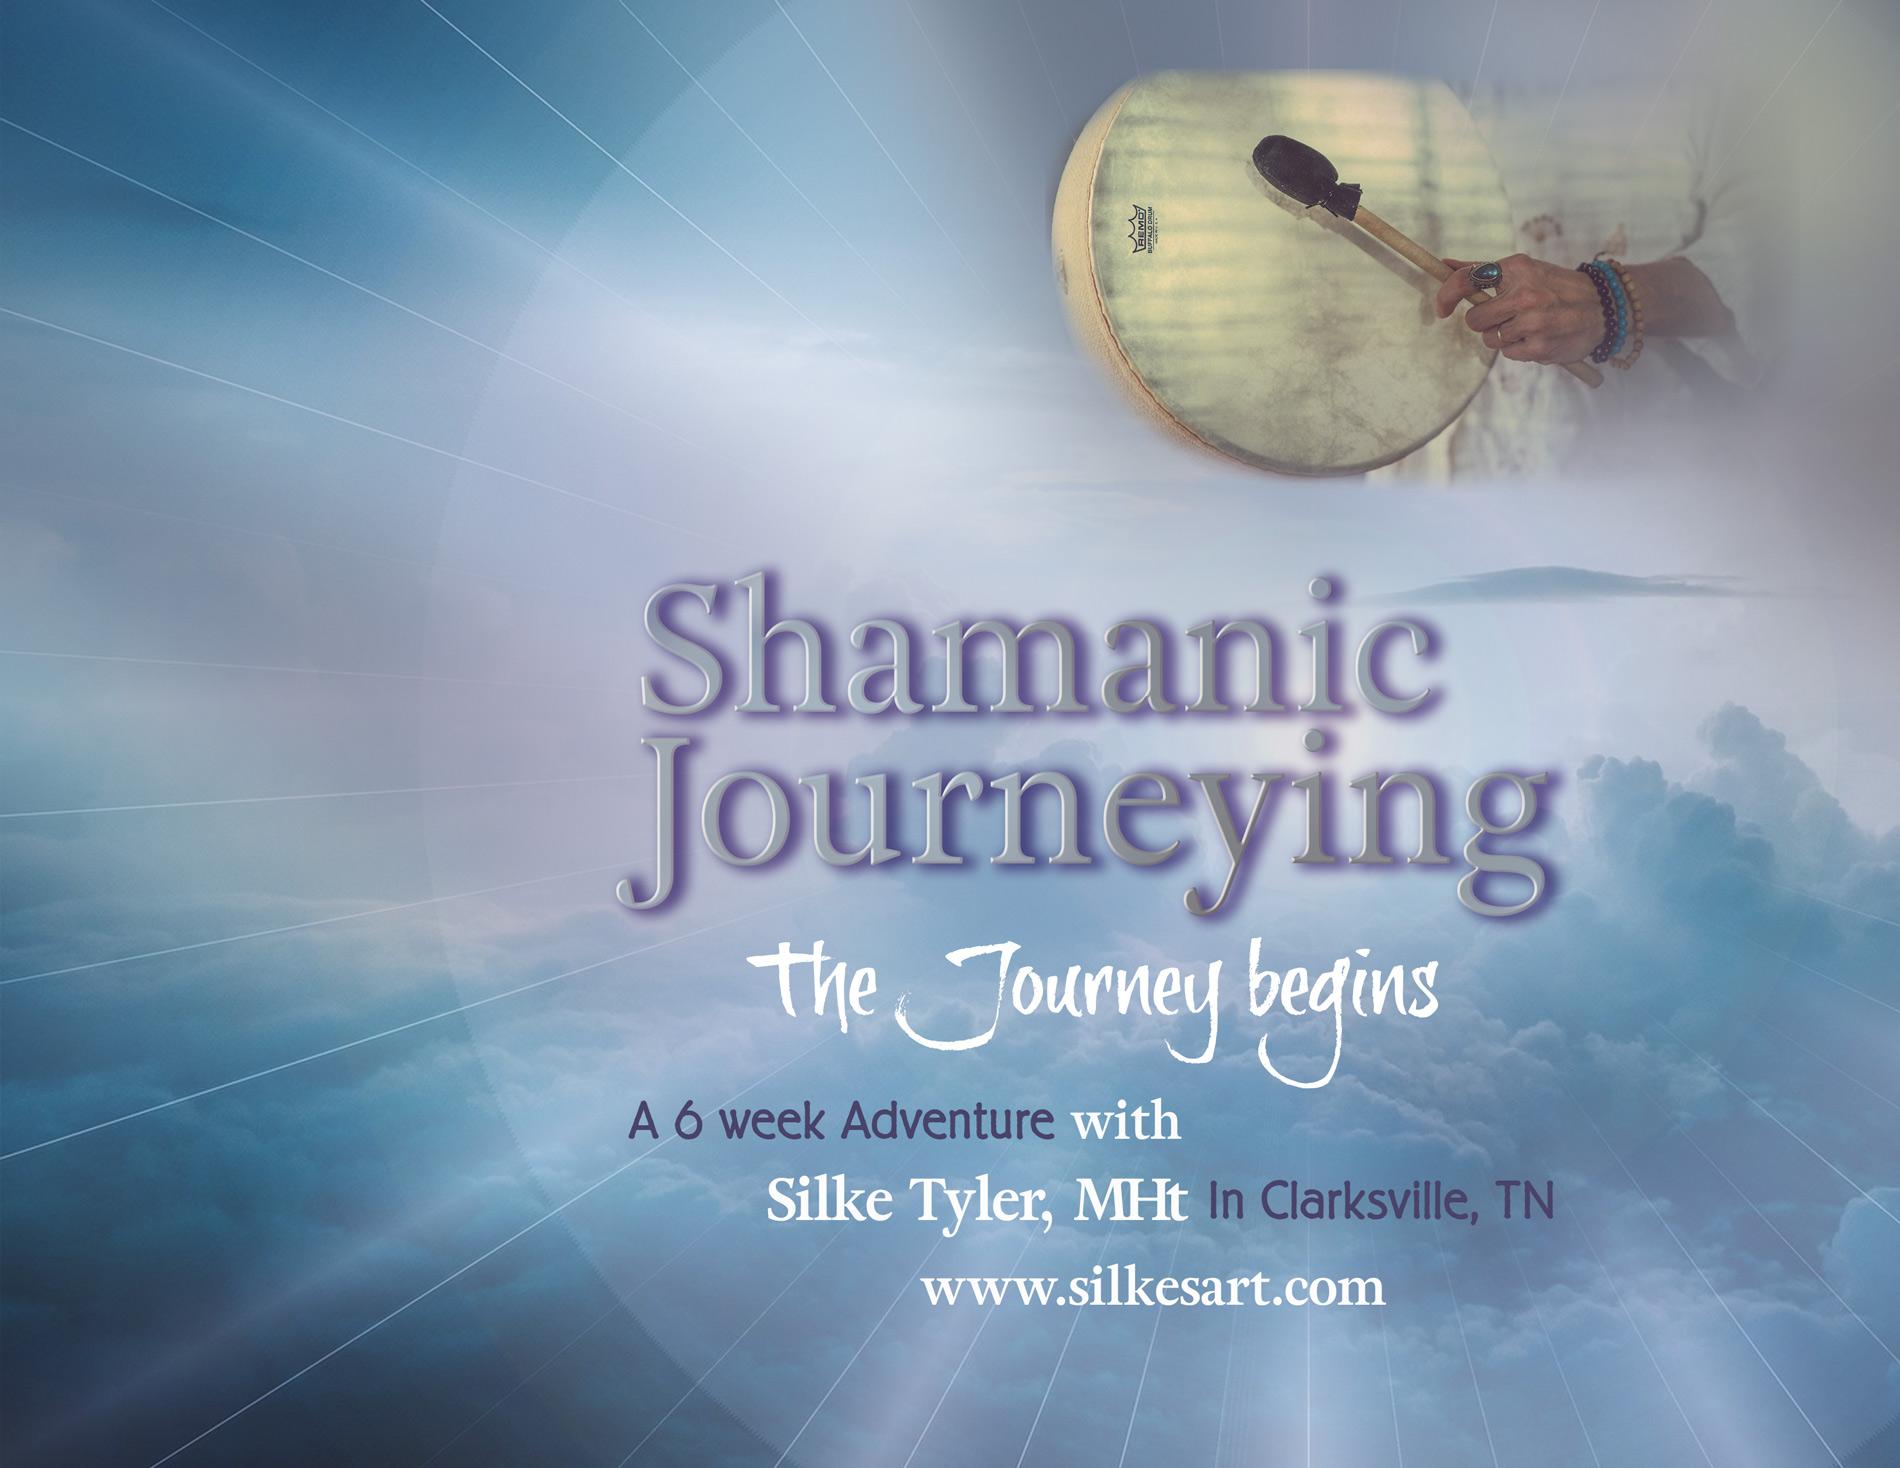 Shamanic-journeying-poster.jpg